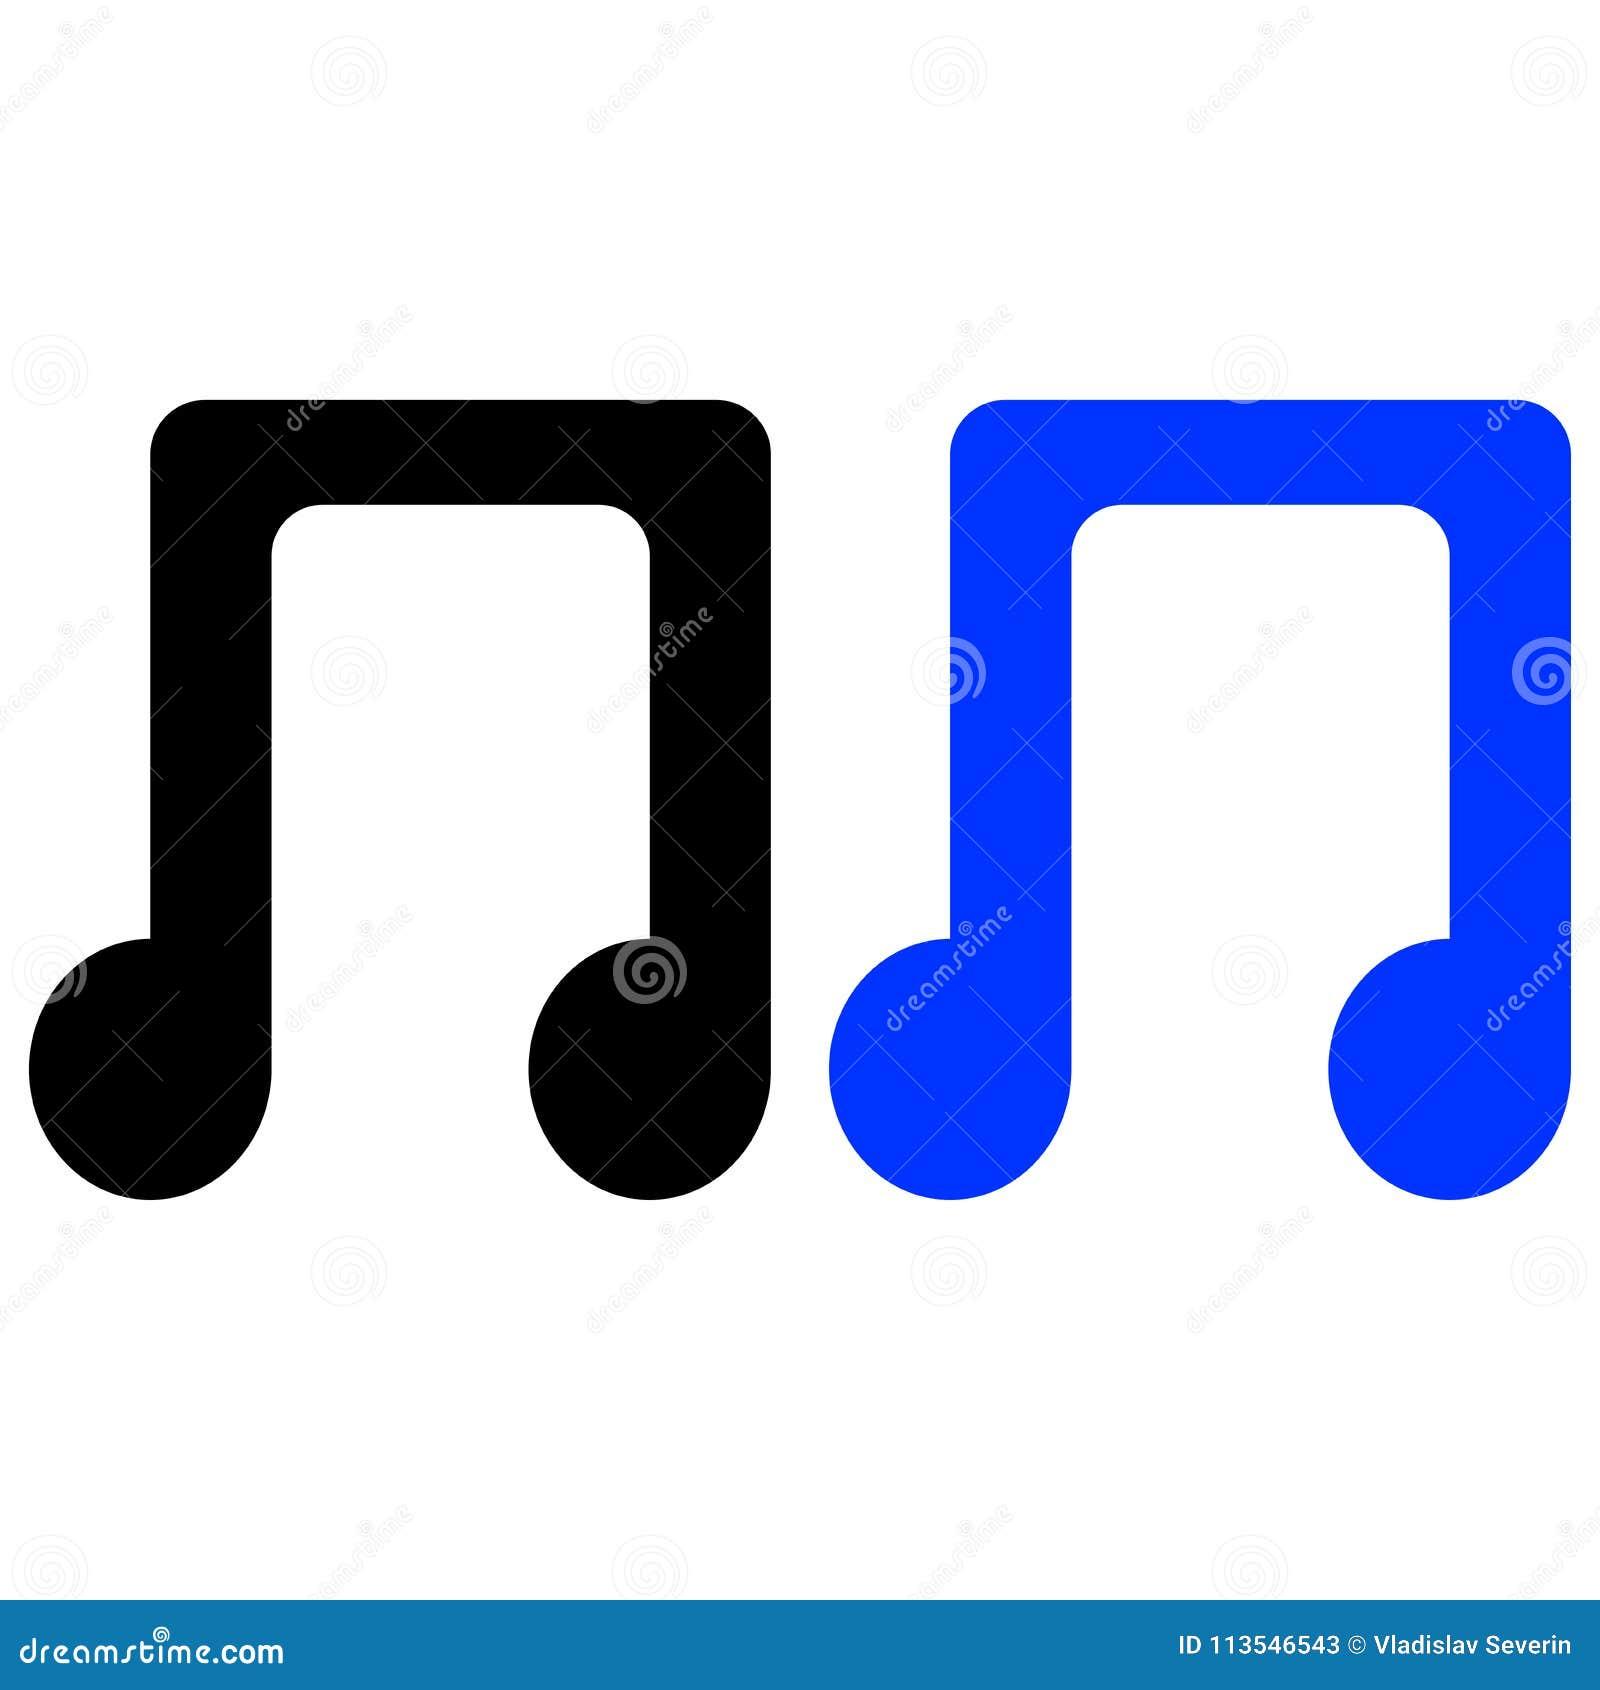 Notas, canción, melodía o tono de la música plano